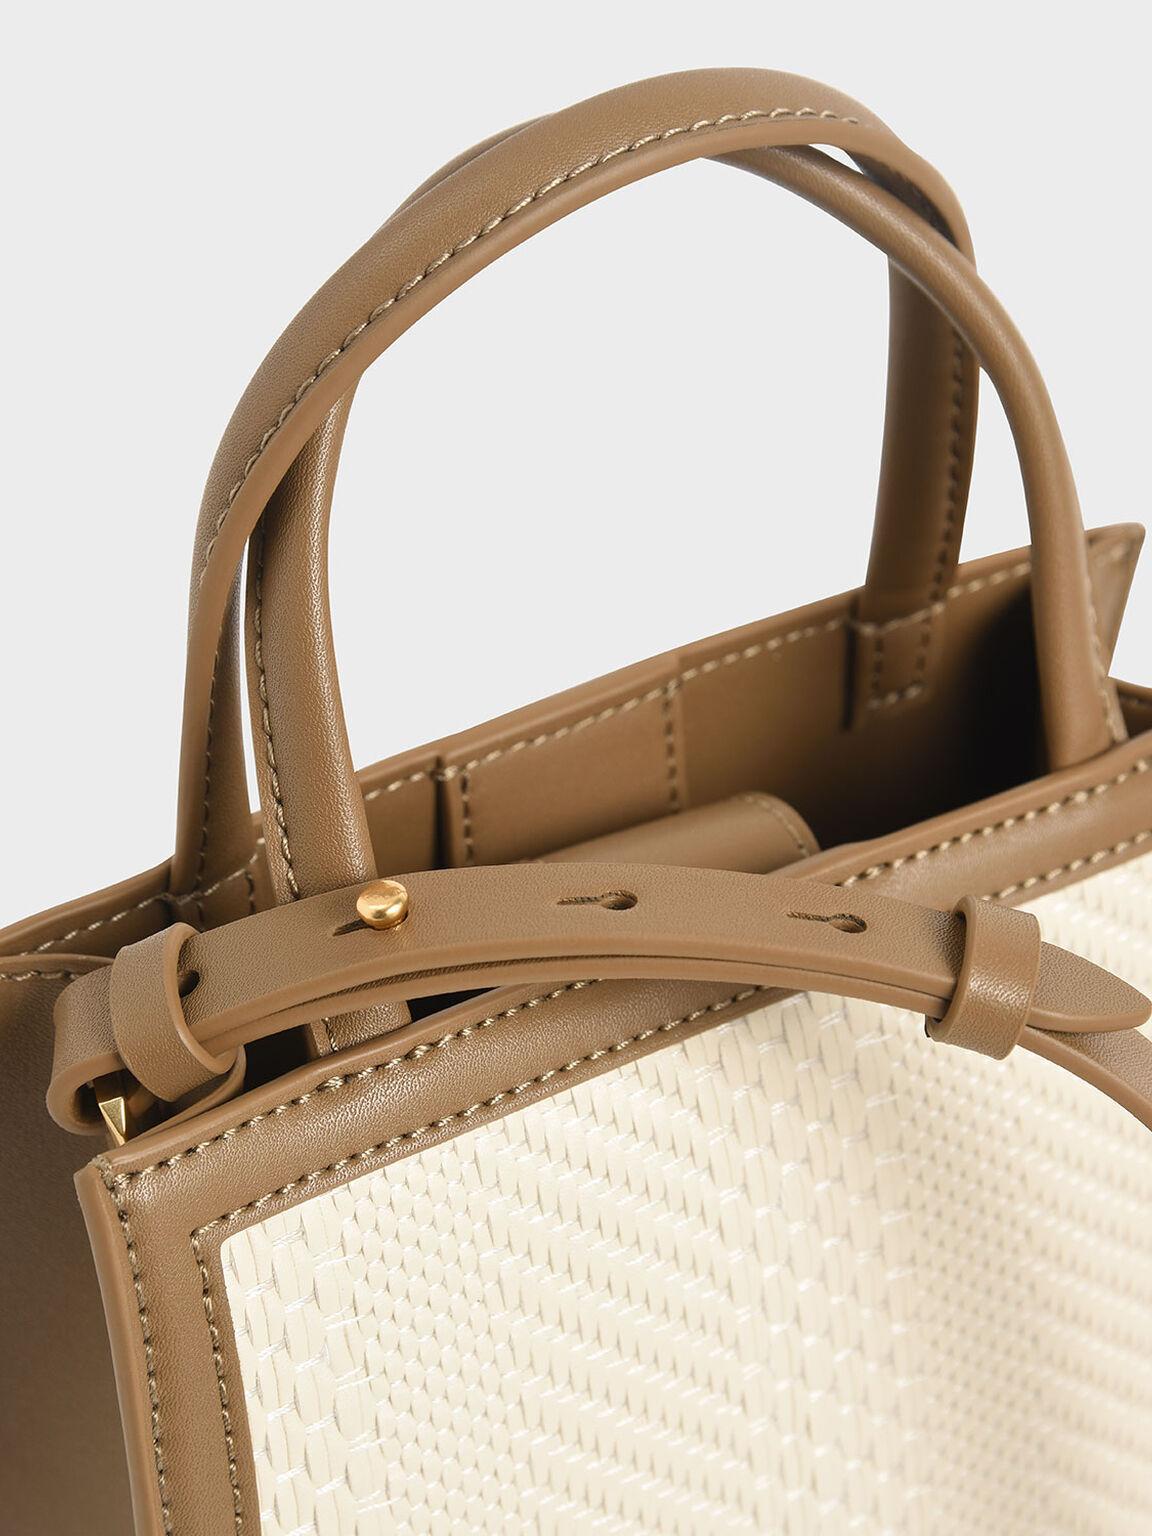 Double Handle Tote Bag, Khaki, hi-res